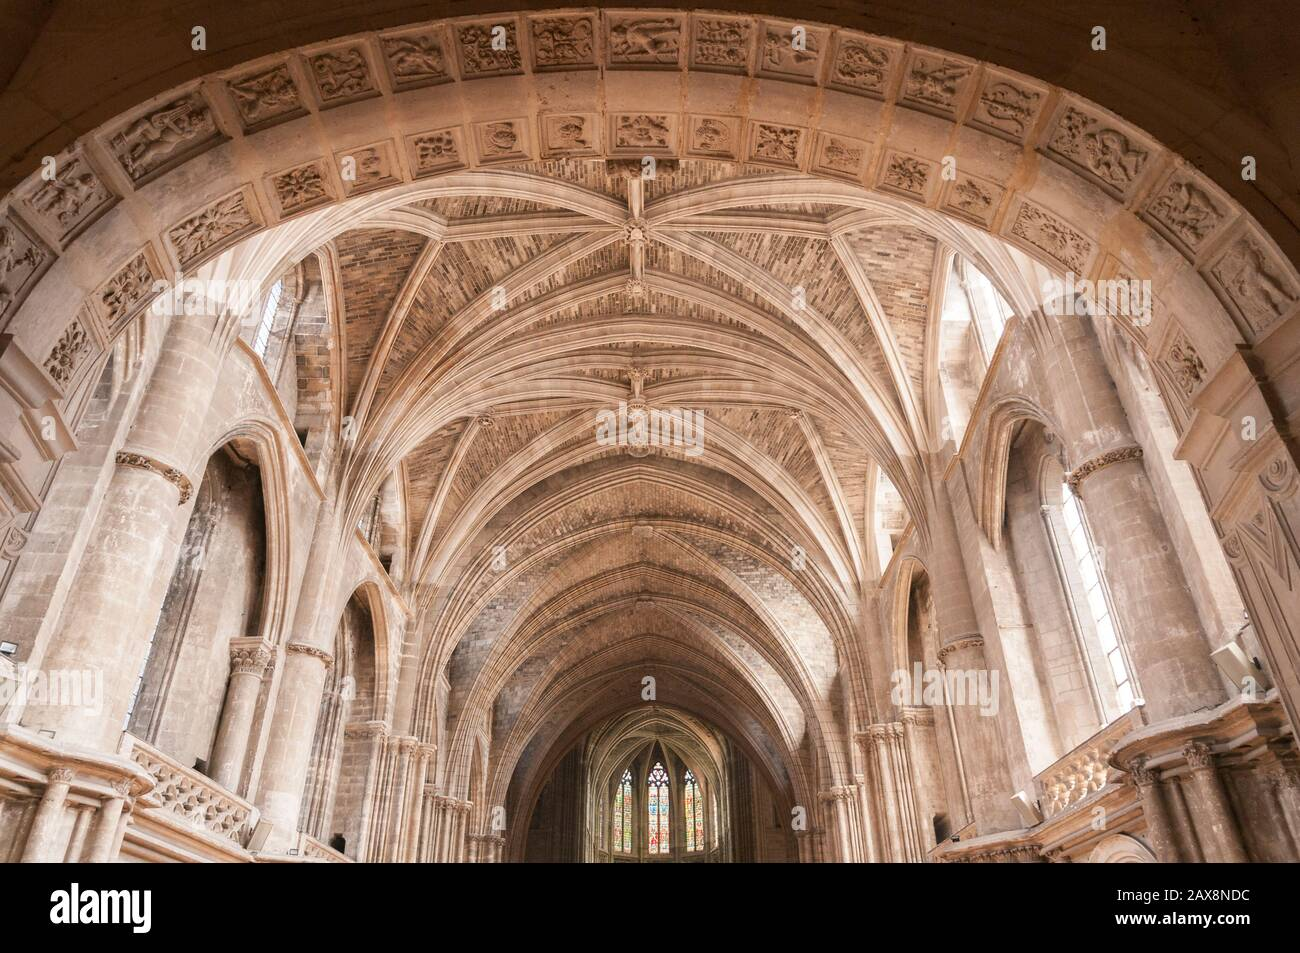 Interieur, Catedral De Burdeos, Burdeos, Aquitania, Frankreich Foto de stock